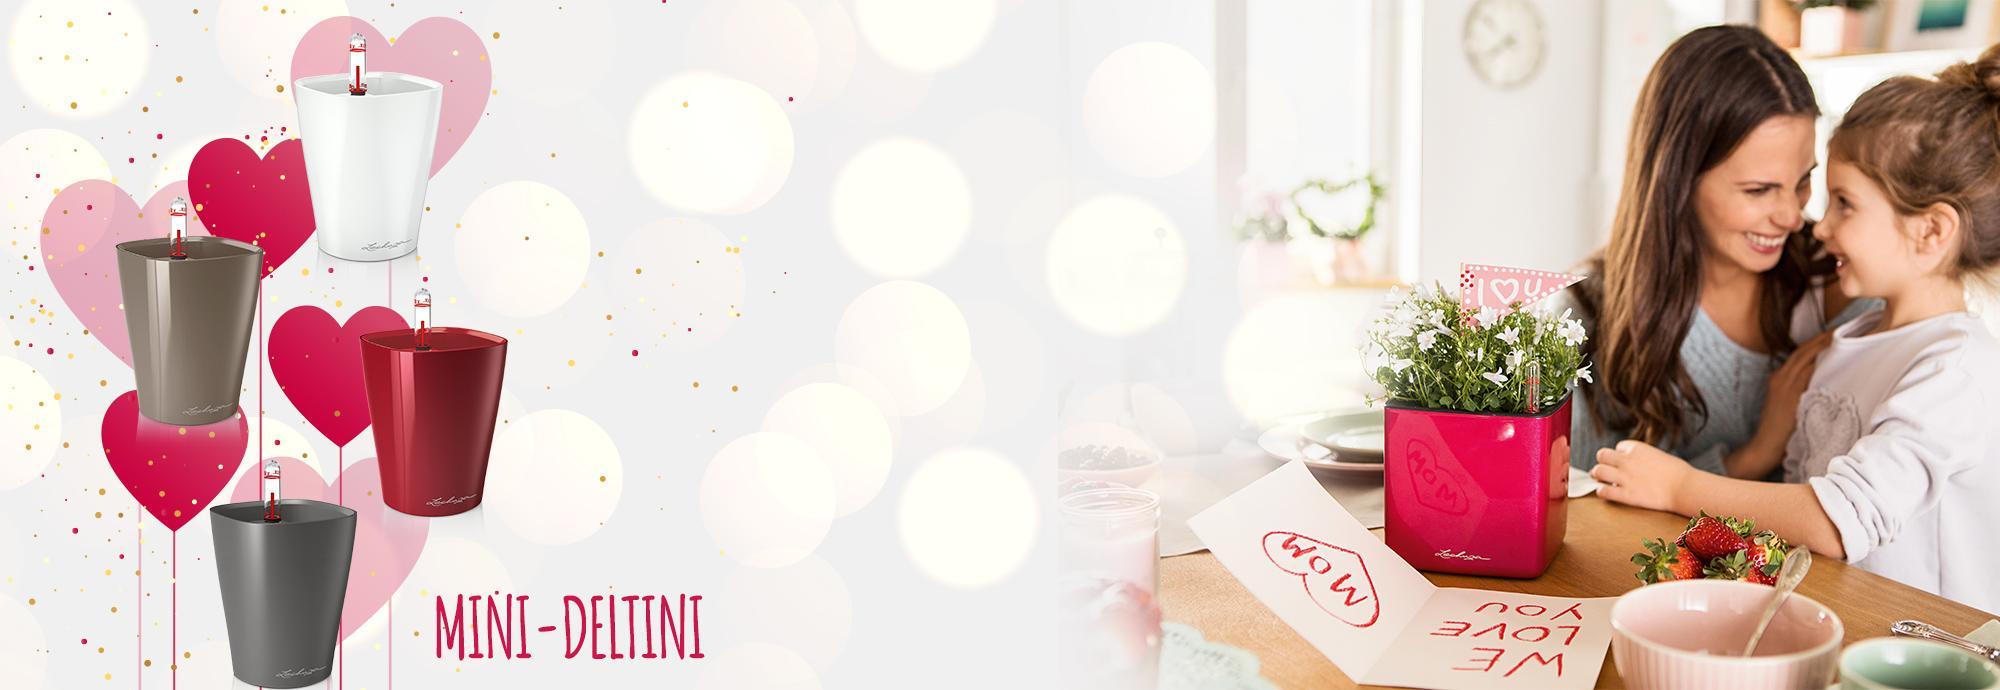 Оформи заказ на 350 BYN и получи кашпо MINI-DELTINI в подарок!